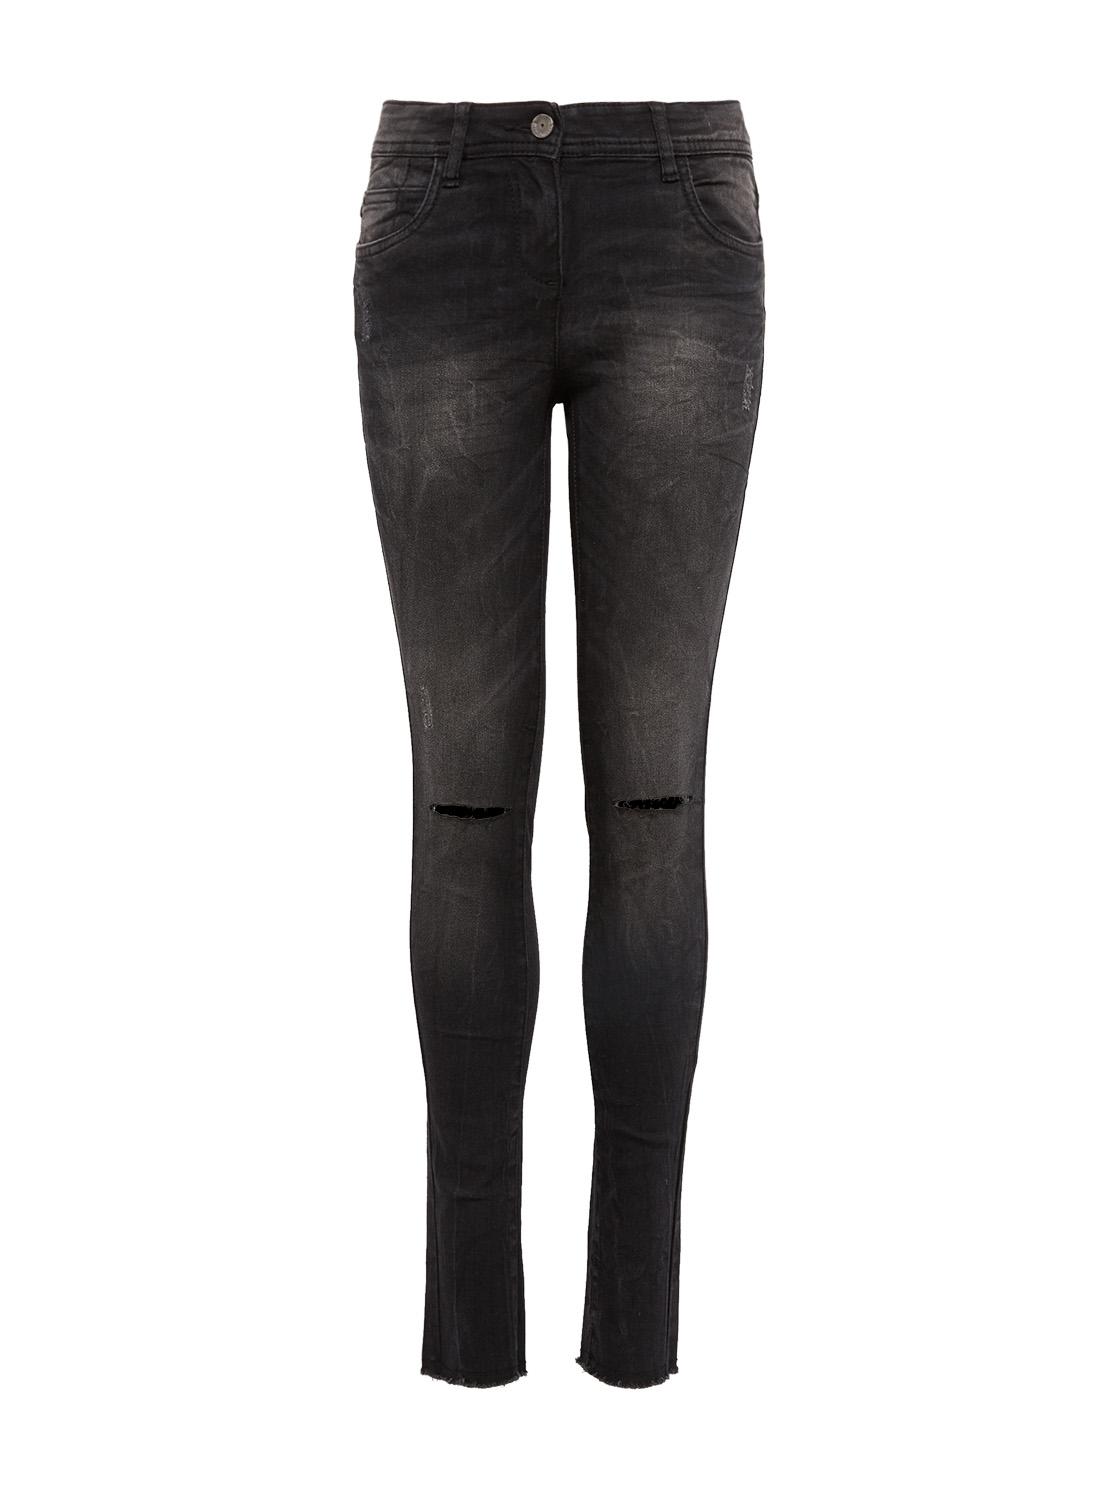 Jeans uni long  LISSIE, dark stone black denim-denim